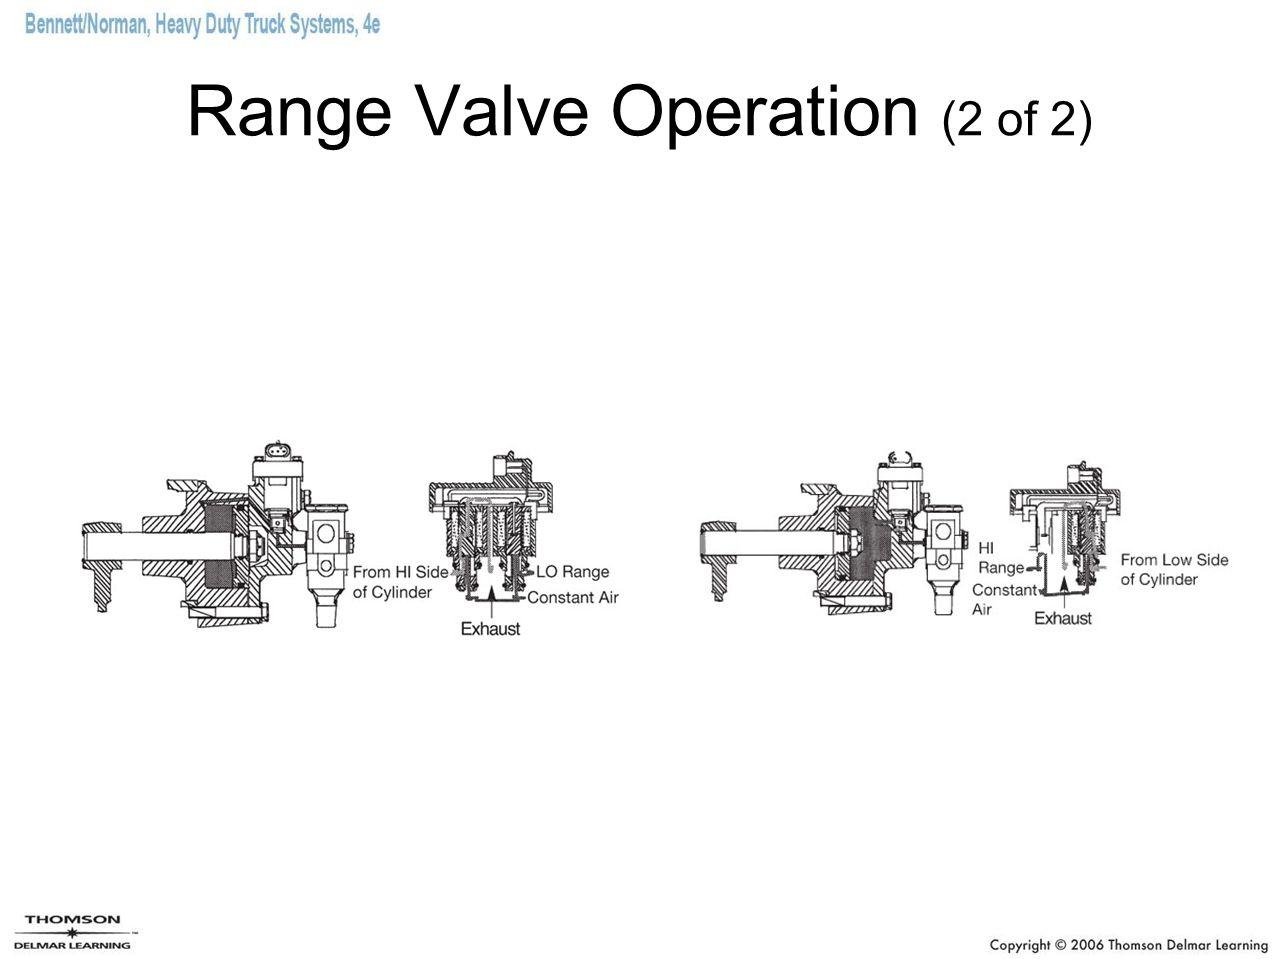 Range Valve Operation (2 of 2)